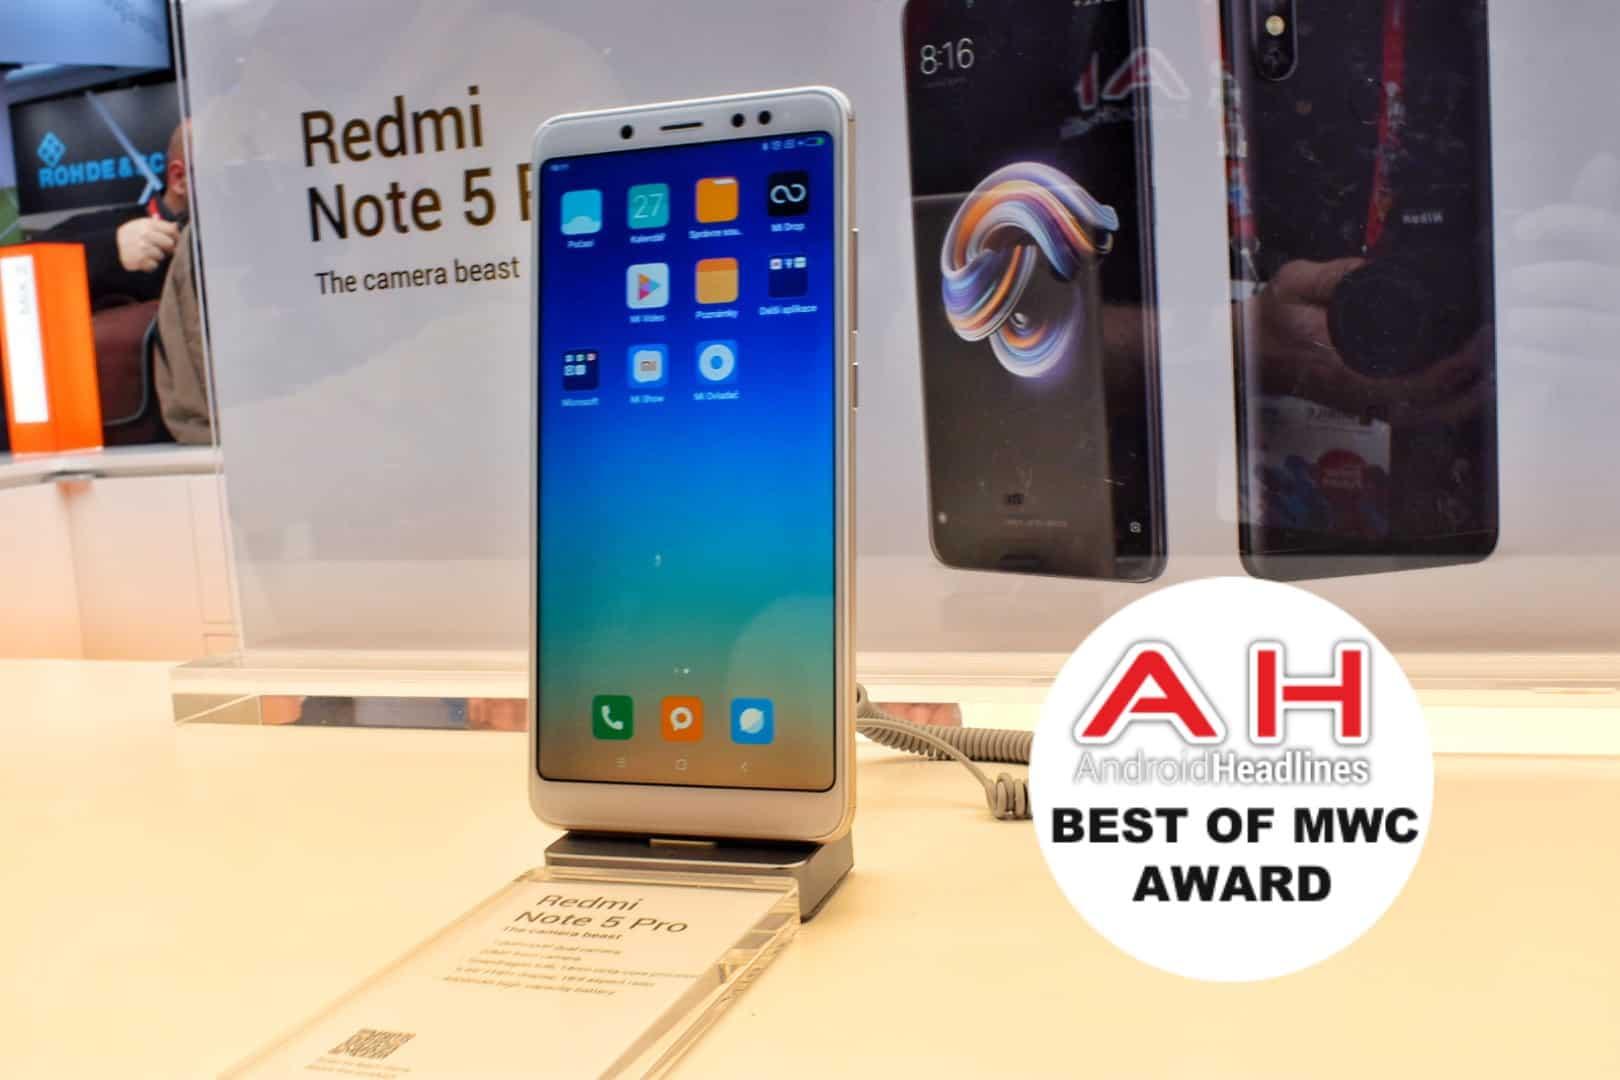 AH Xiaomi Redmi Note 5 Pro best of MWC 2018 award 3